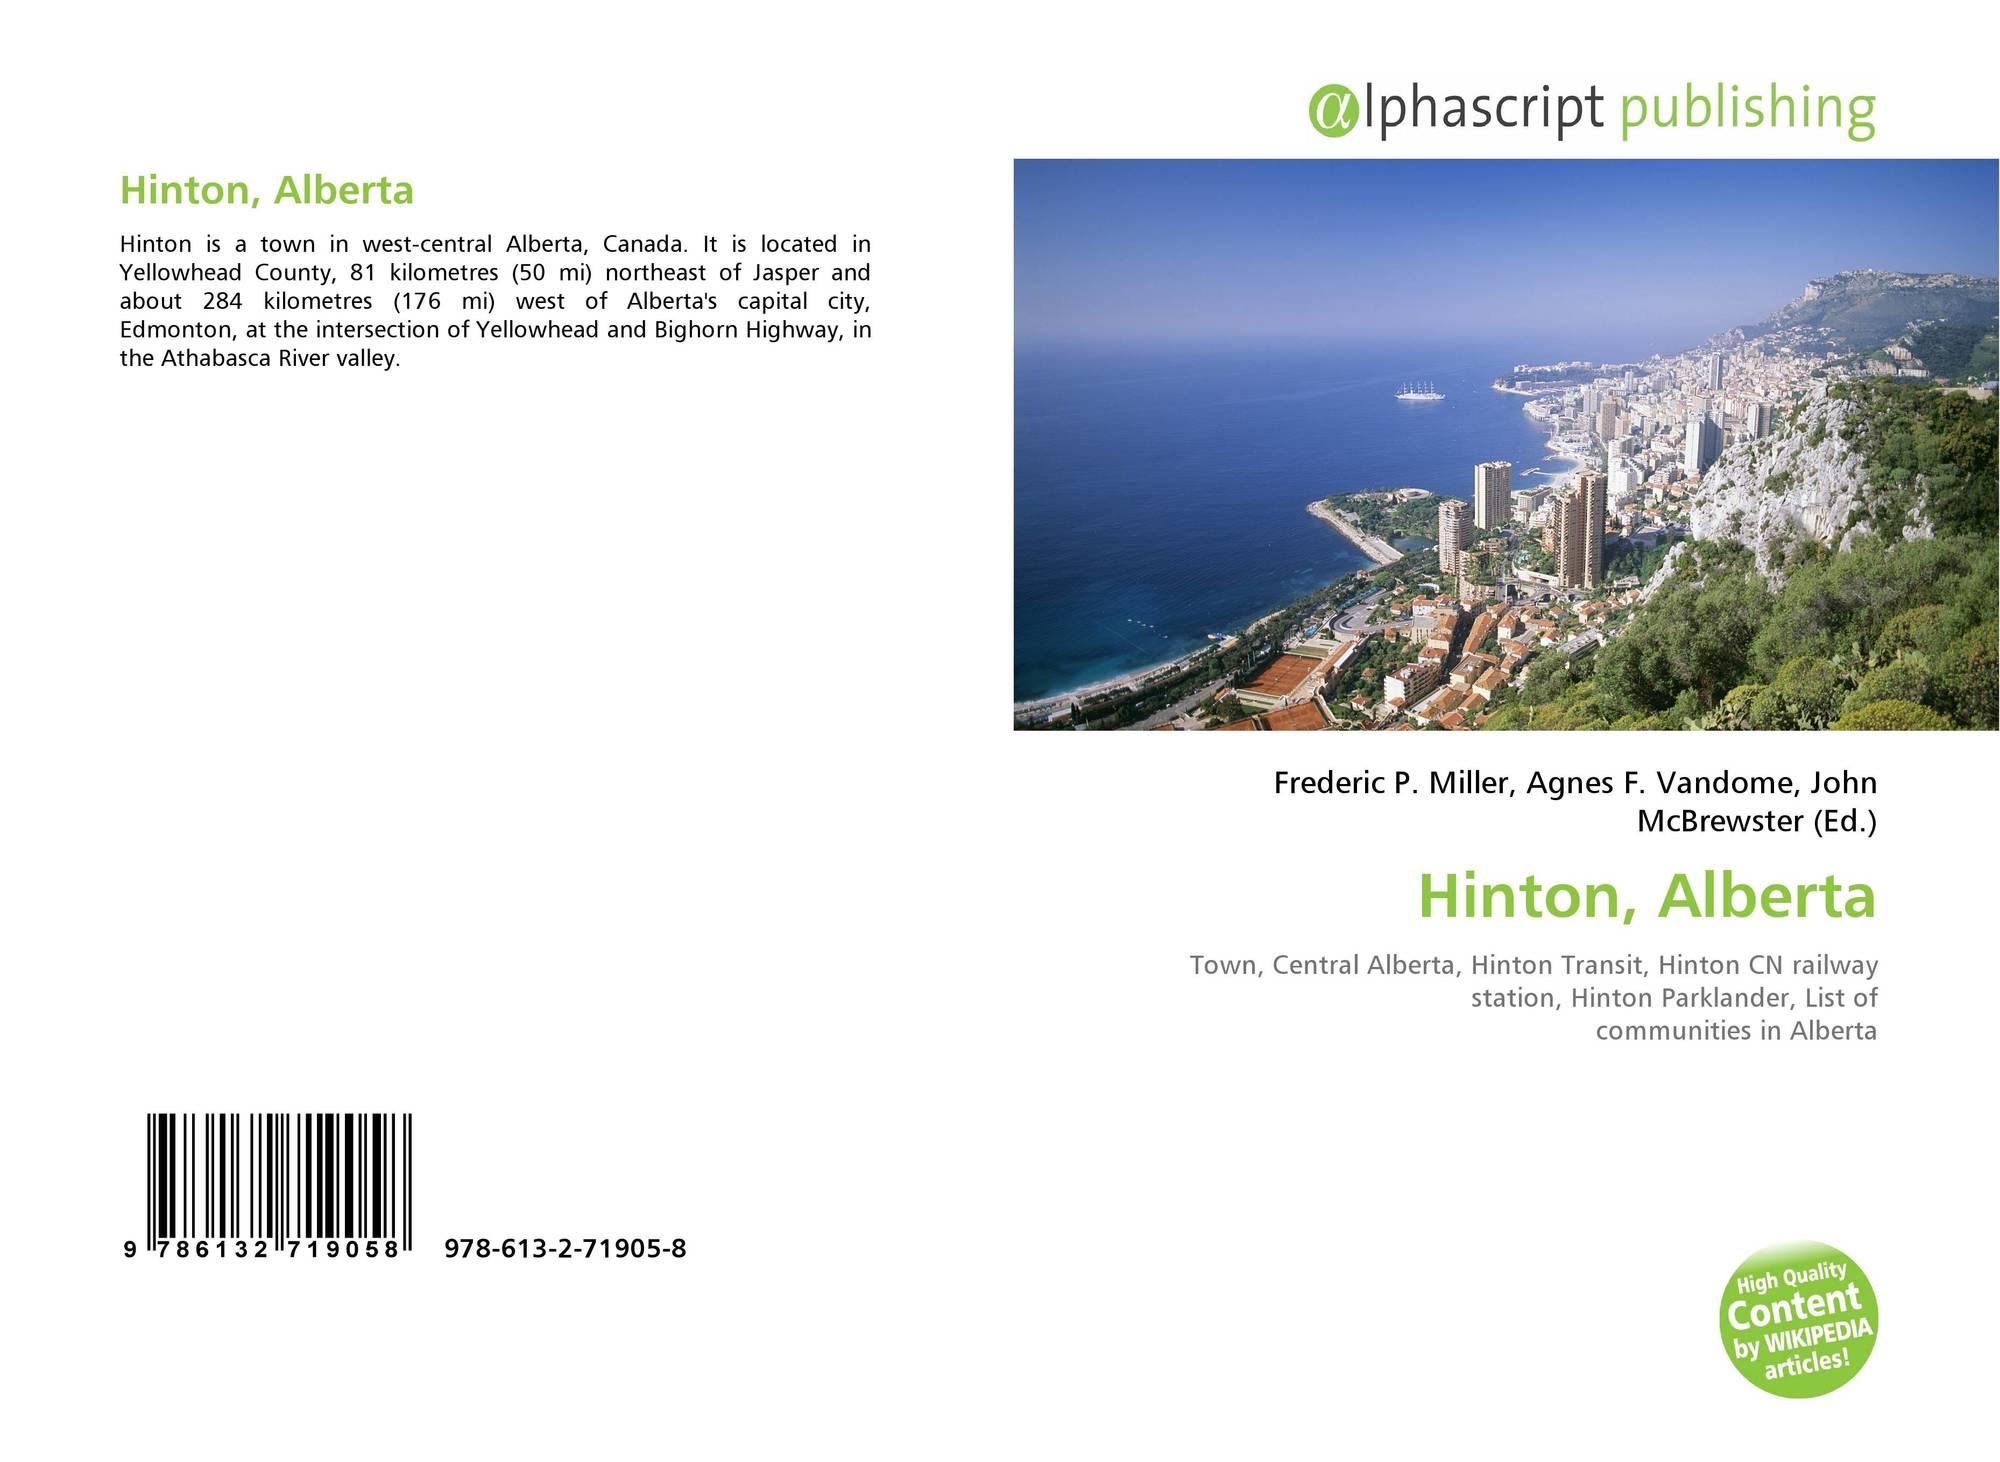 Hinton, Alberta, 978-613-2-71905-8, 6132719059 ,9786132719058